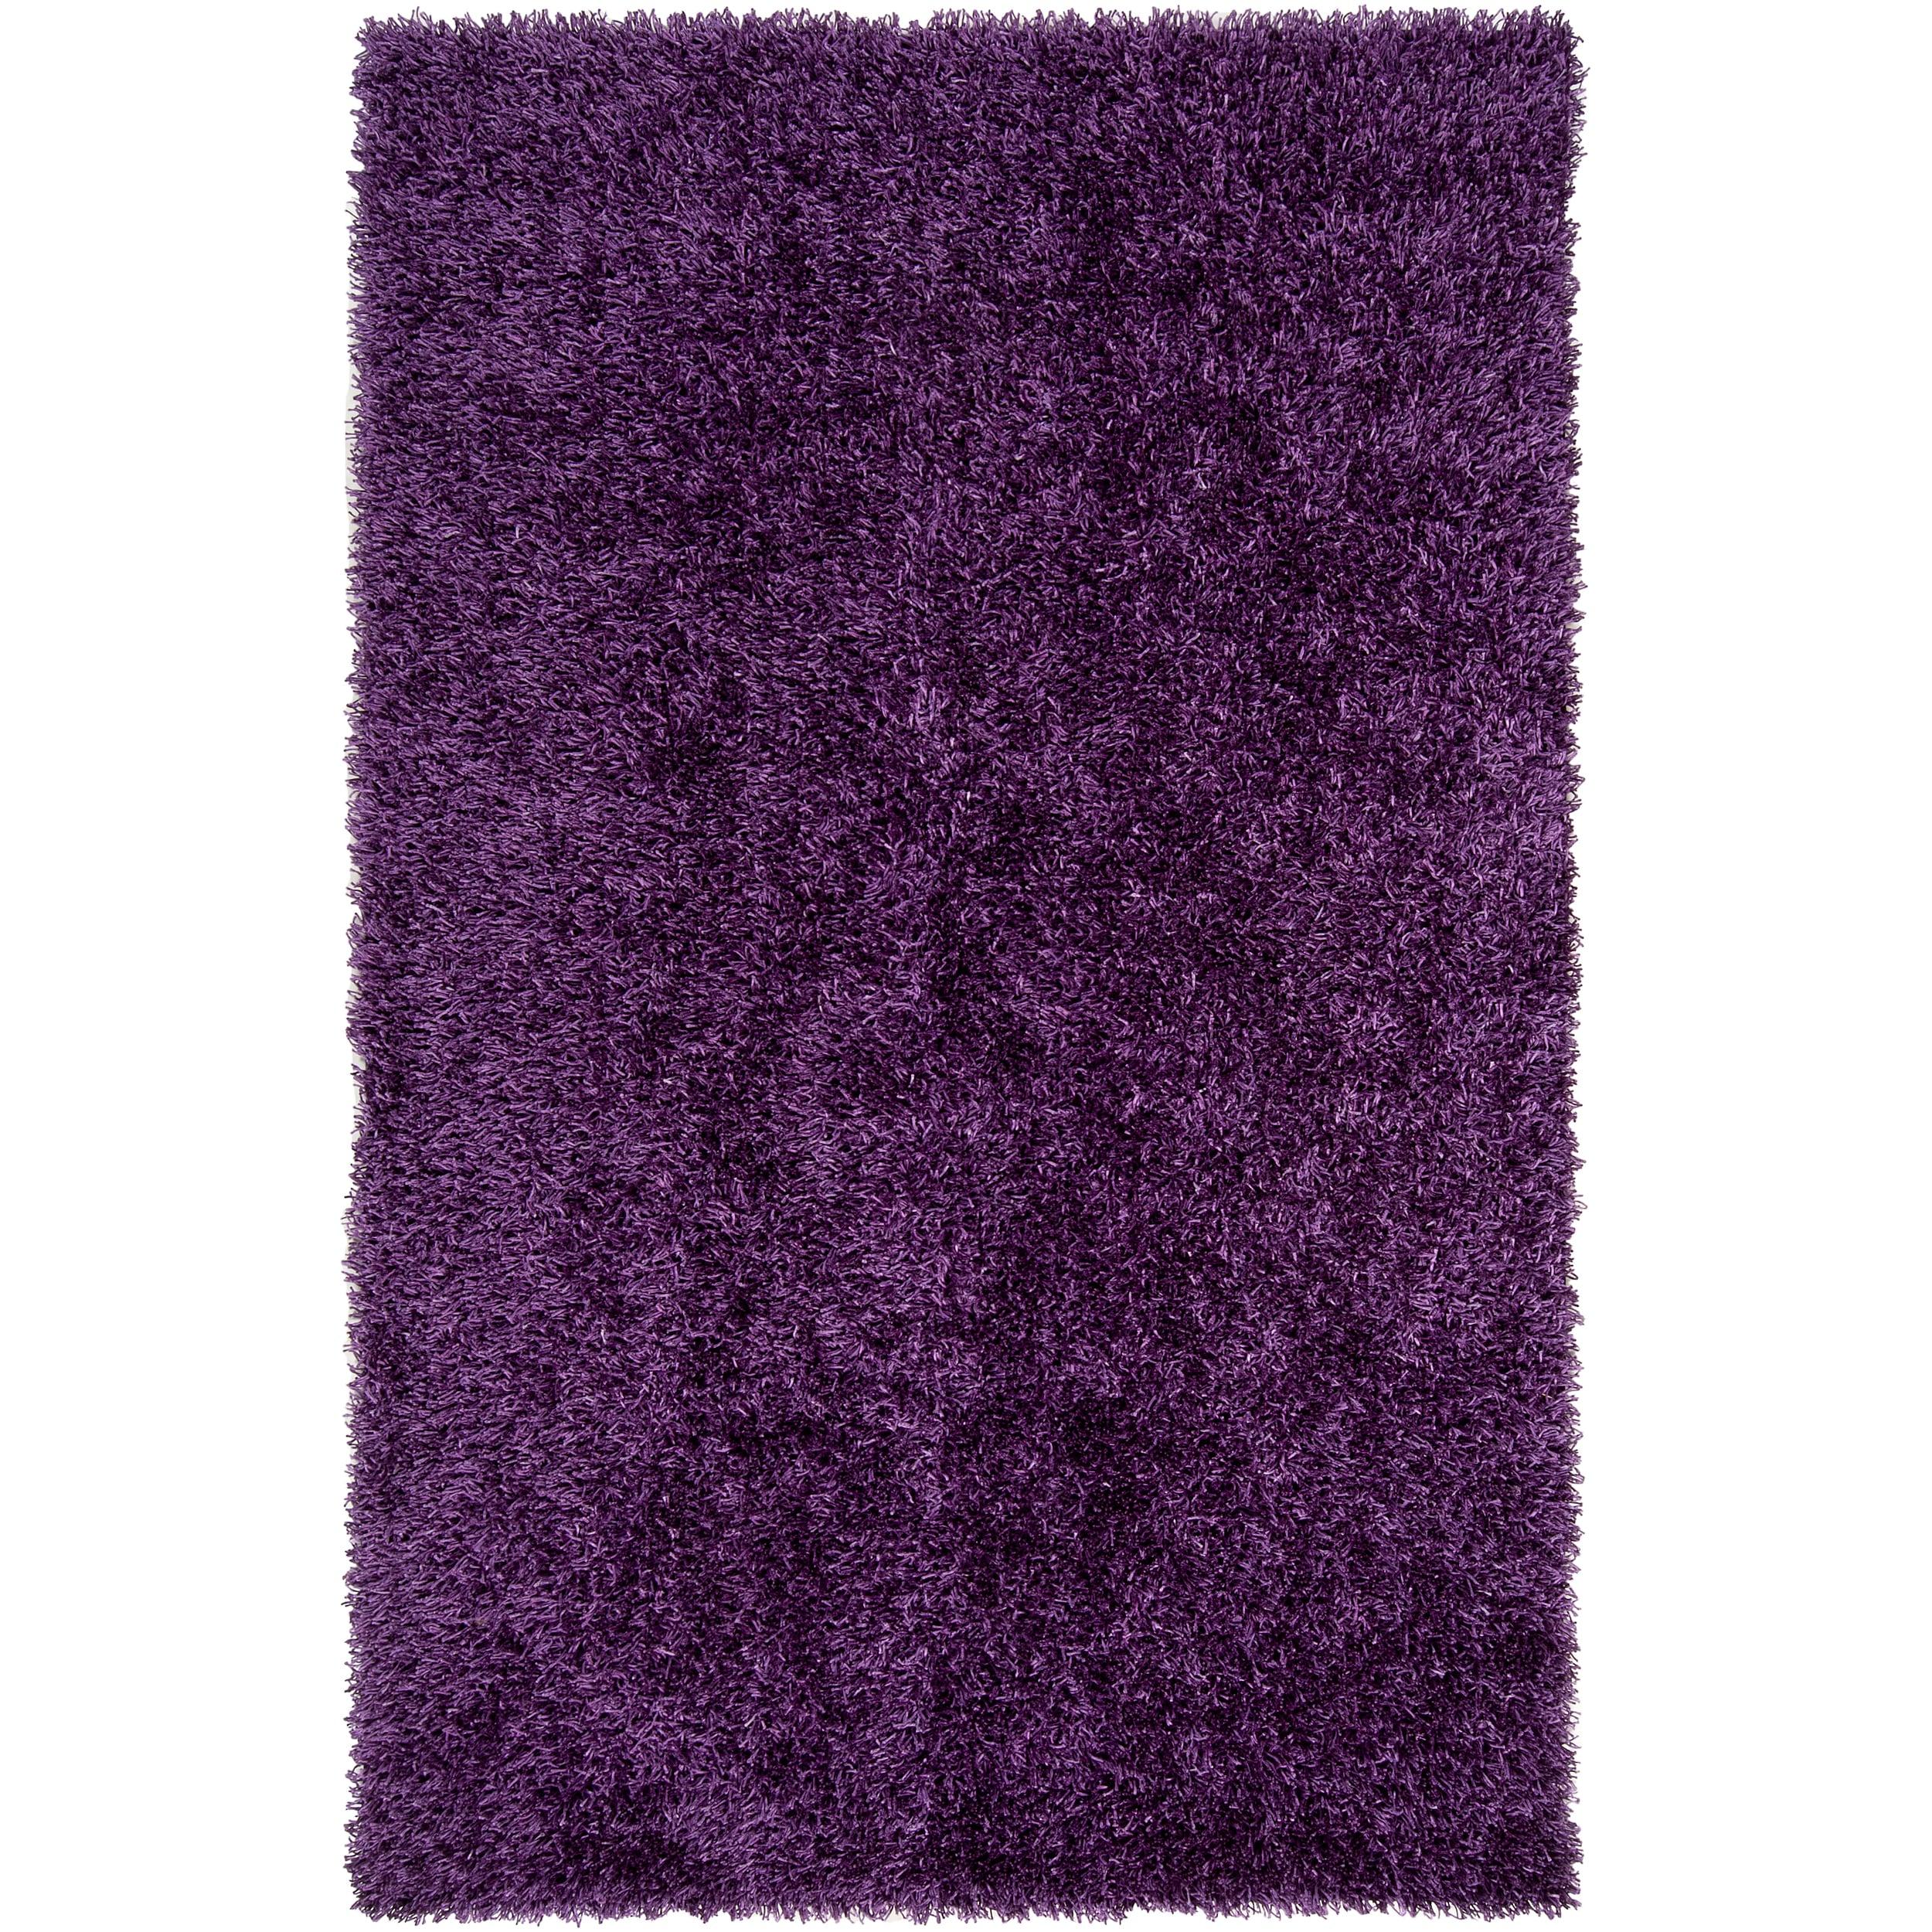 Hand-woven Purple Ferta Soft Shag Rug (5' x 8')